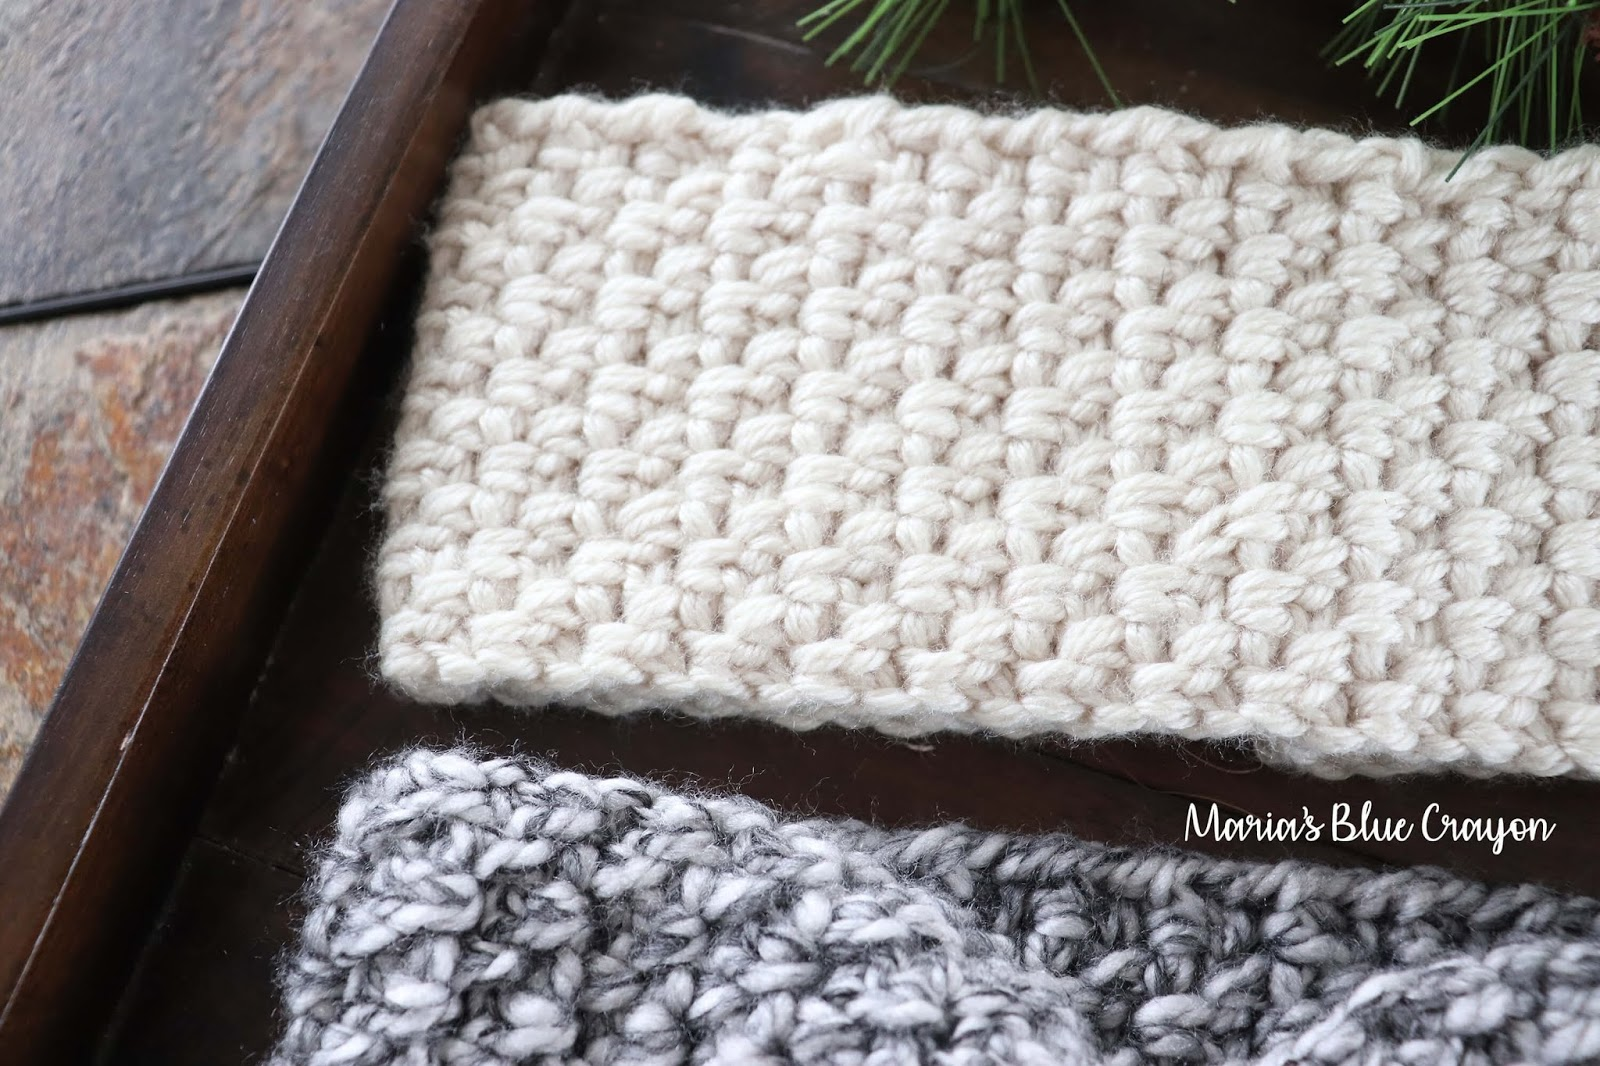 Chunky Crochet Ear Warmer Free Crochet Pattern Marias Blue Crayon